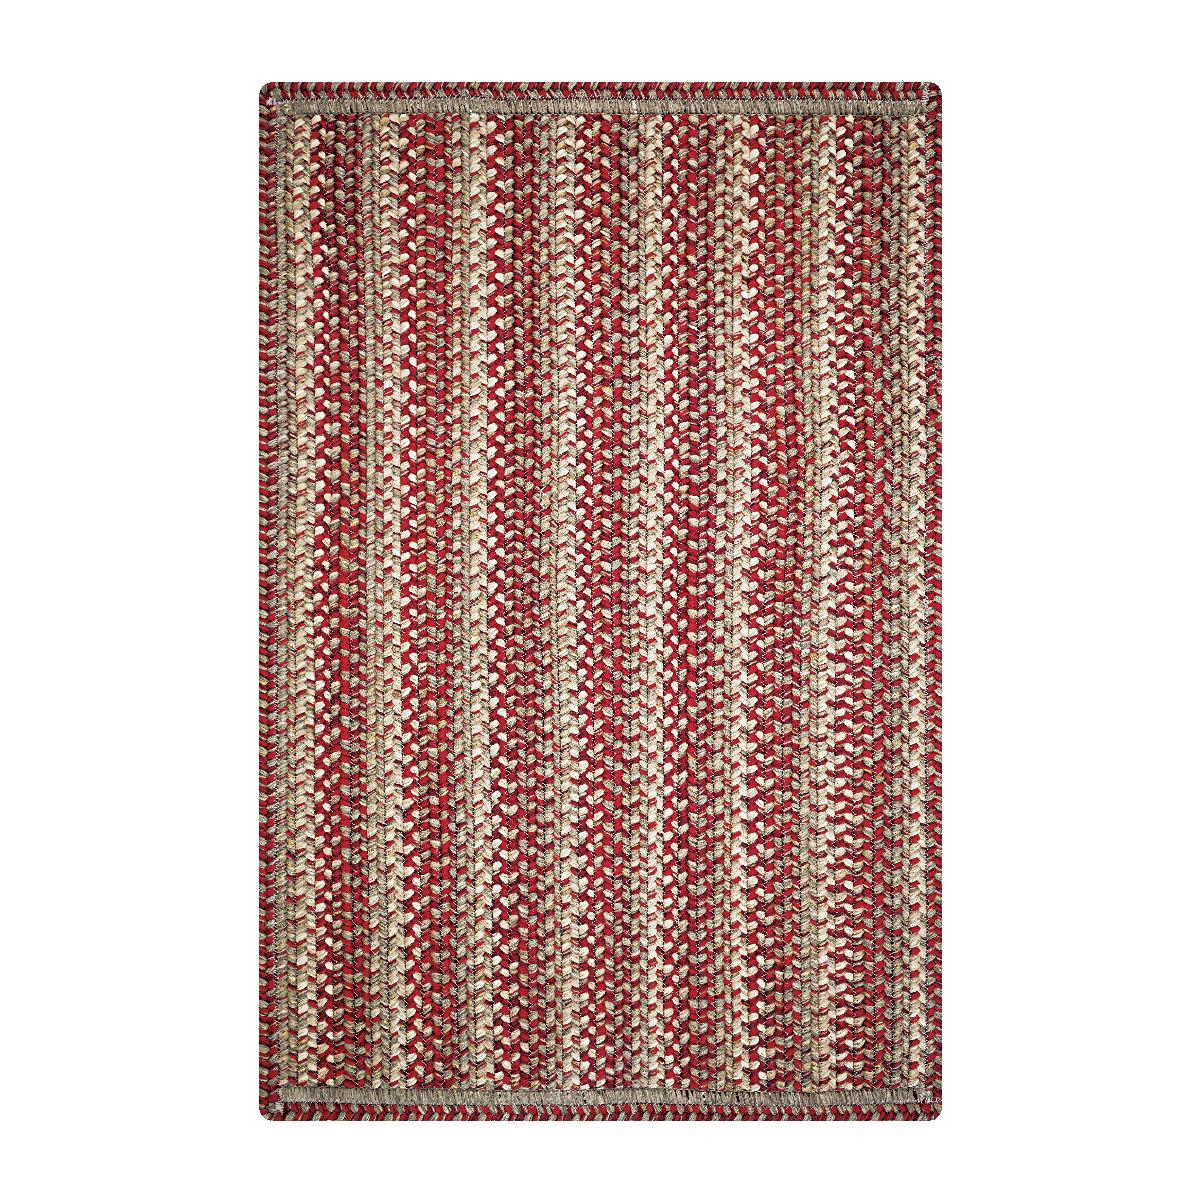 August Grove Emilee Hand Braided Red Area Rug Wayfair